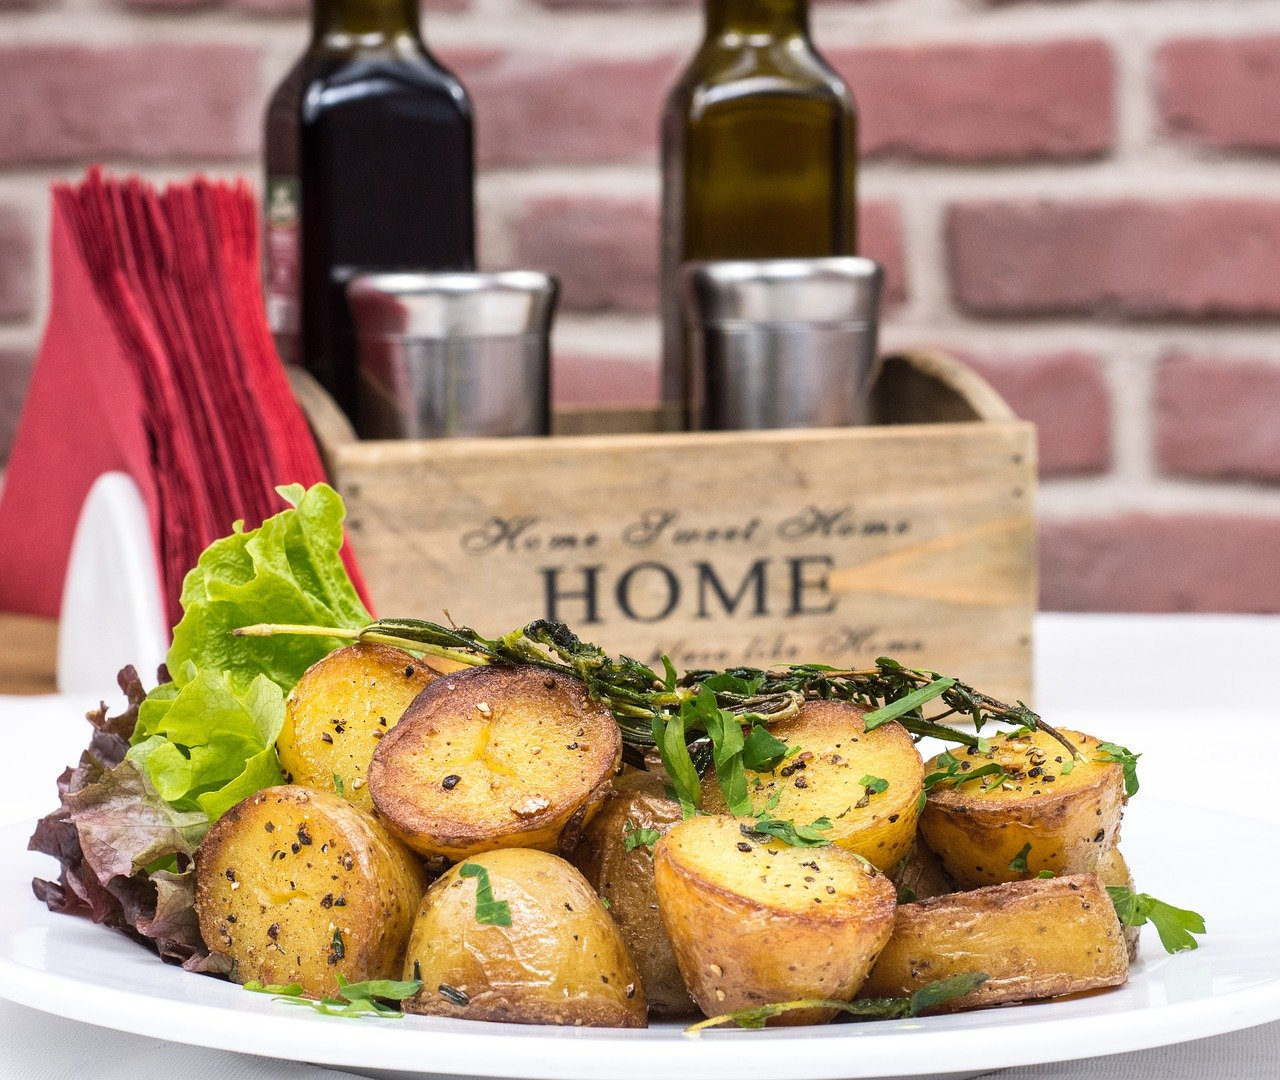 baked-potatoes-2157201_1280.jpg